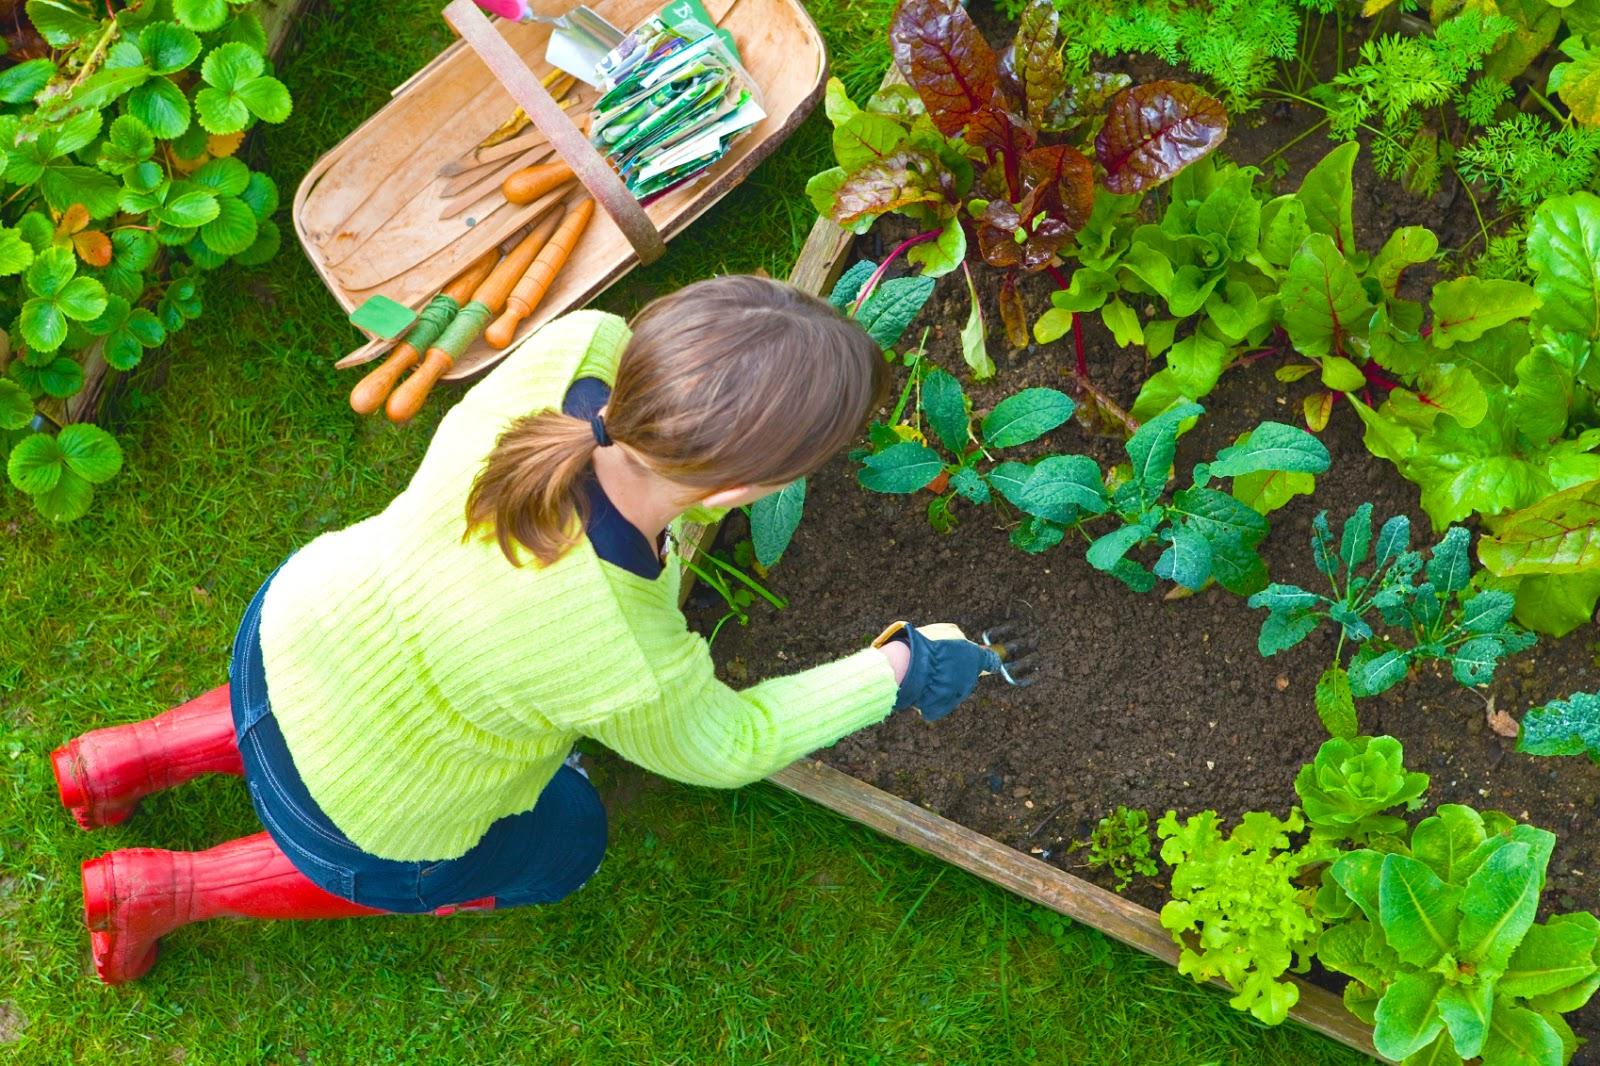 6 Wonderful health benefits of gardening